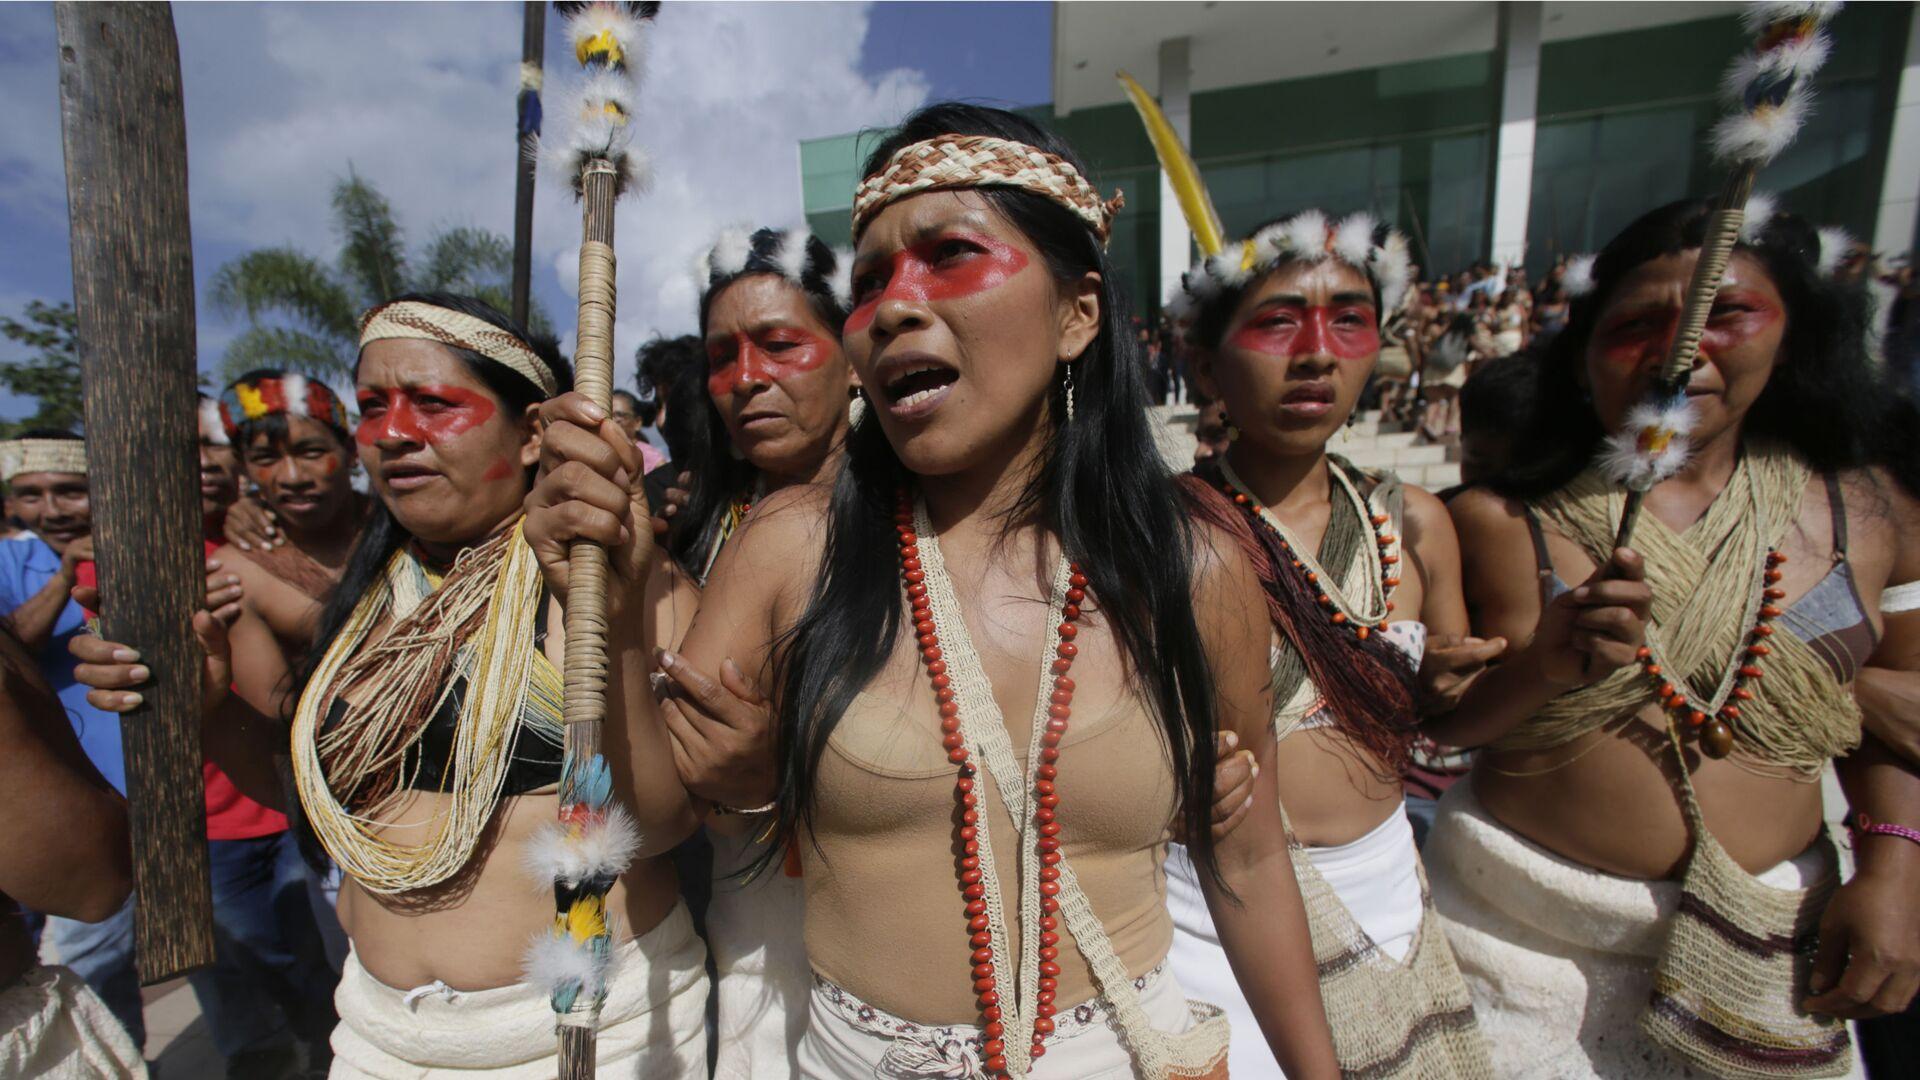 Nemonte Nenquimo, líder indígena del pueblo Waorani - Sputnik Mundo, 1920, 08.03.2021